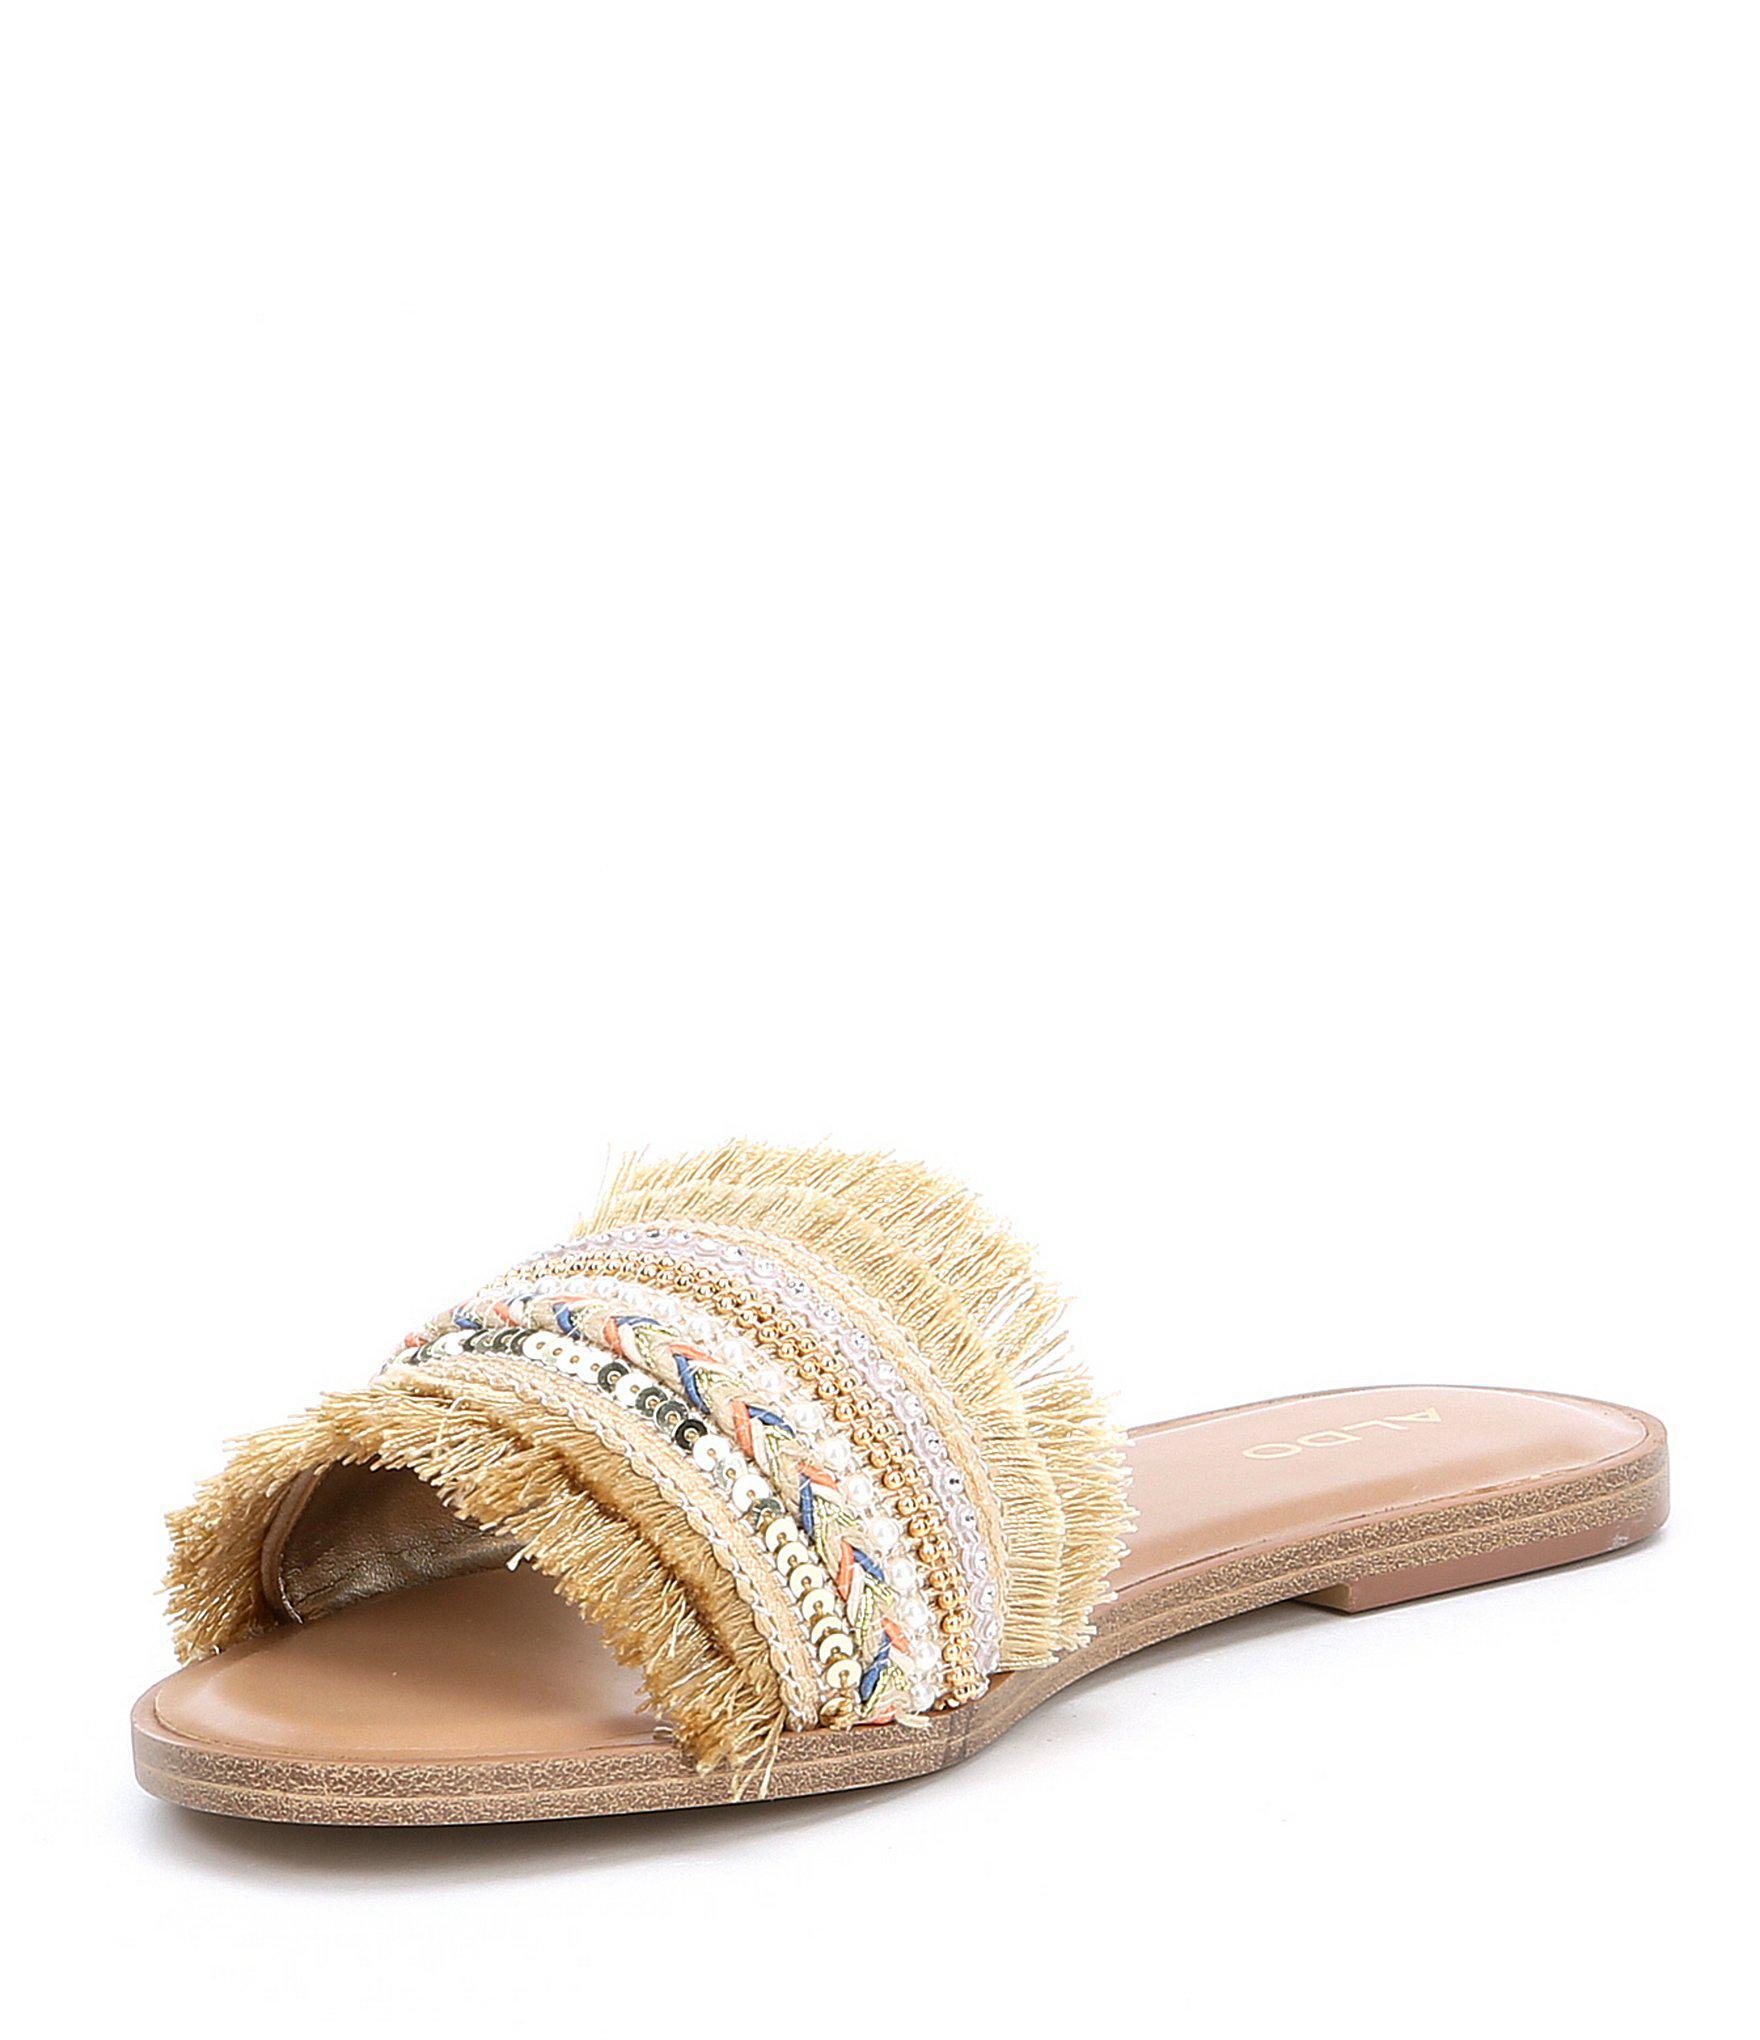 34b1d5641b2d Lyst - ALDO Castlerock Fringe Slide Sandals in Metallic